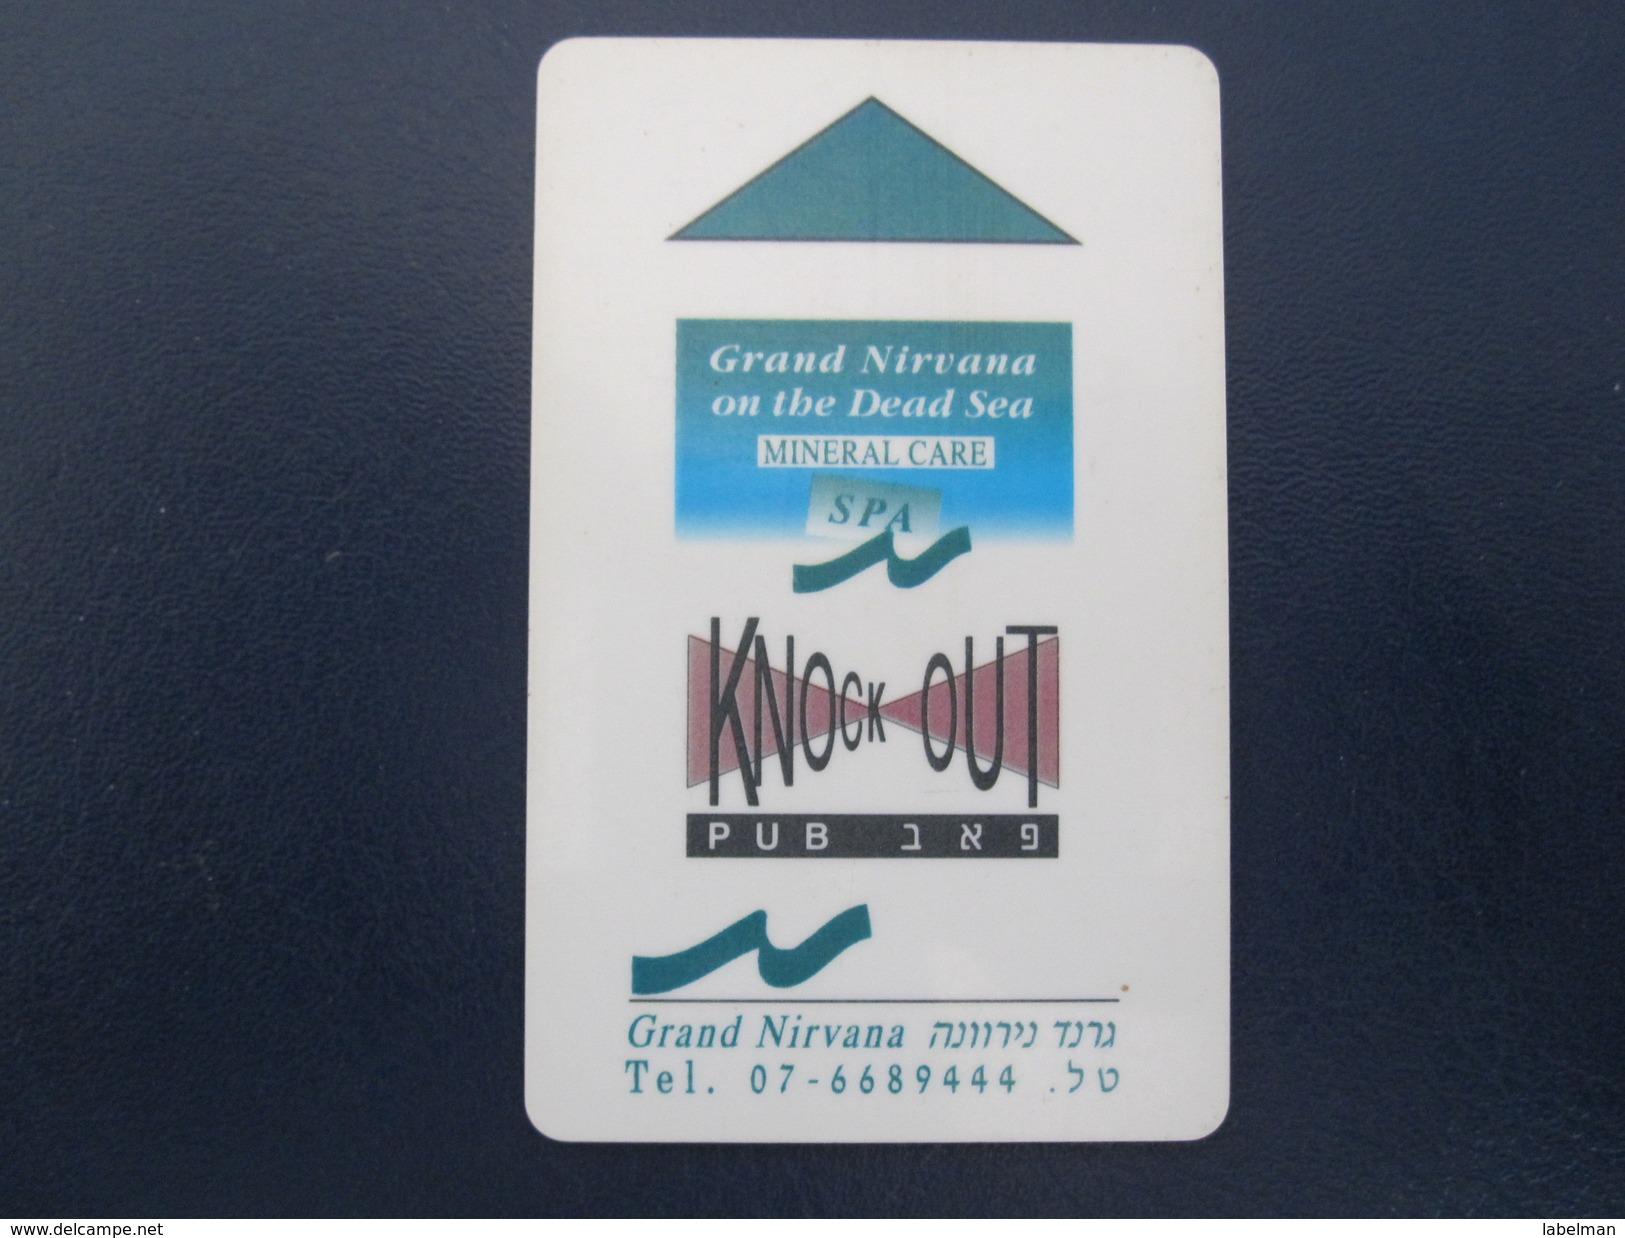 HOTEL MOTEL INN CLUB GRAND NIRVANA TEL AVIV TIBERIAS DEAD SEA HAIFA JERUSALEM TIBERIAS EILAT KEY TOWEL CARD ISRAEL - Hotel Labels